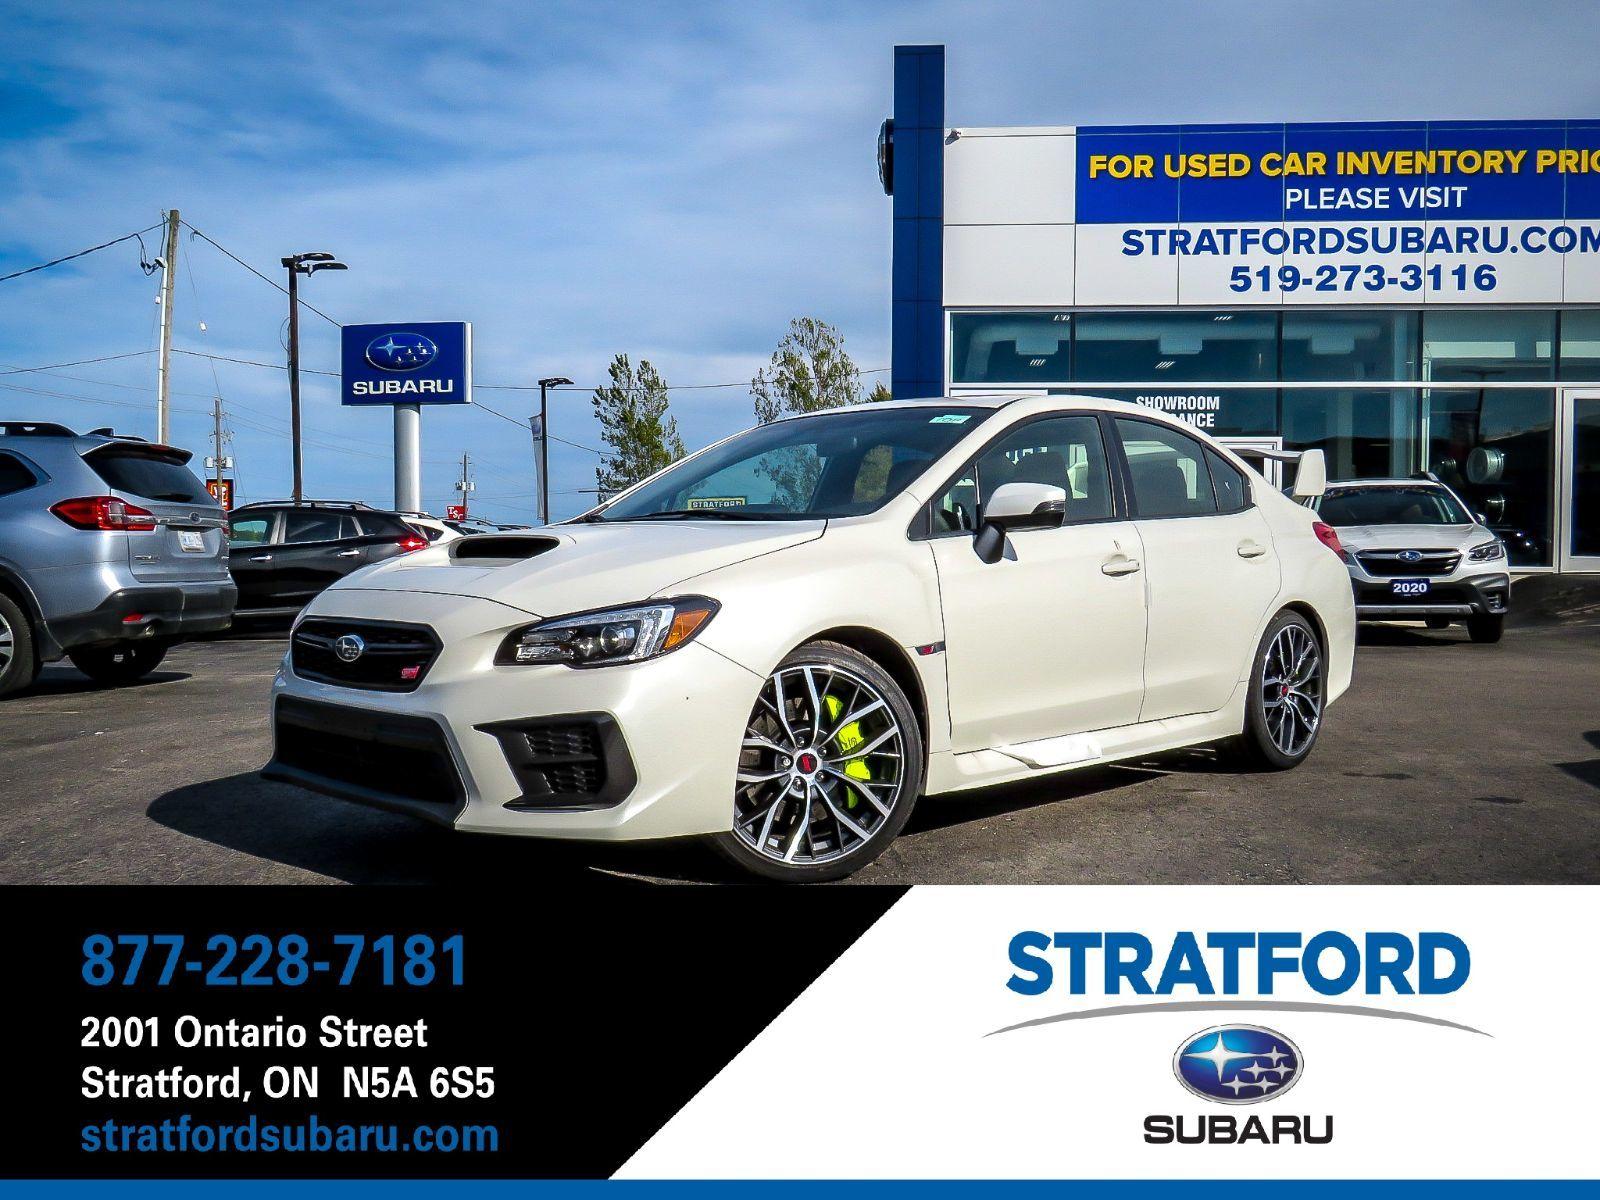 Stratford Subaru | 2020 WRX STI Sport-tech - 49354 0$ | S982